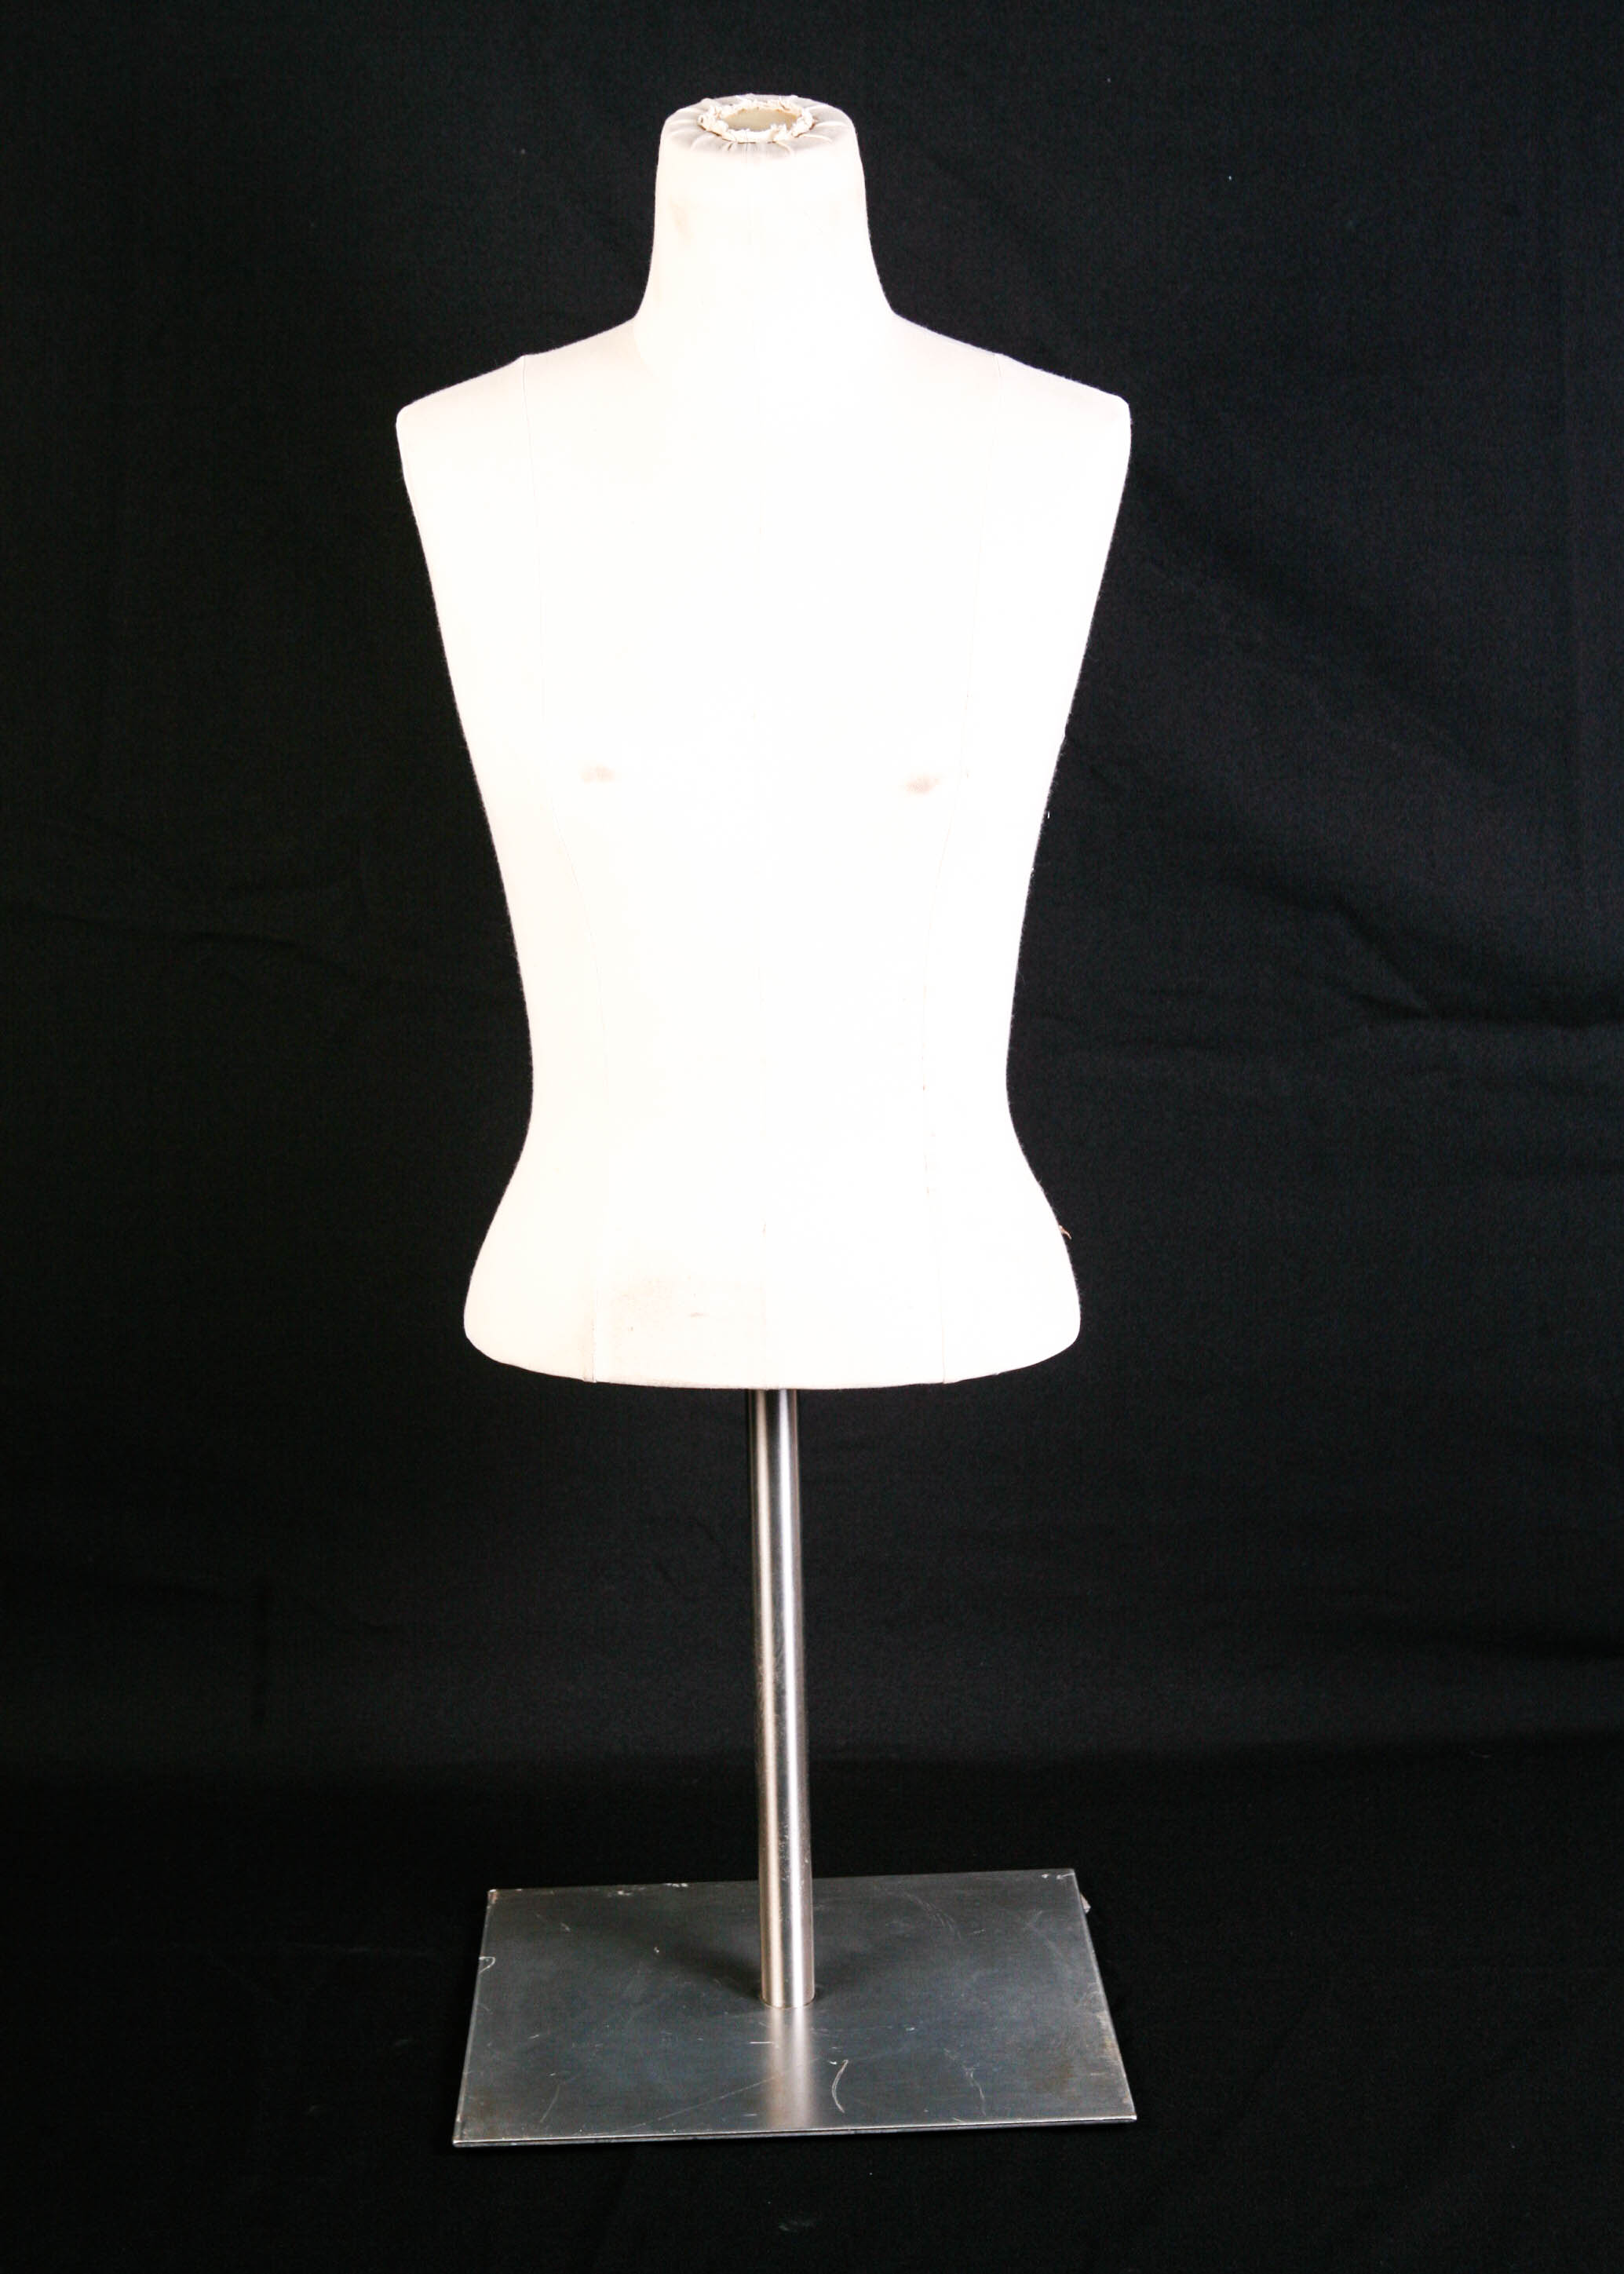 mannequin chair stand oslo posture nz desk top canvas on ebth